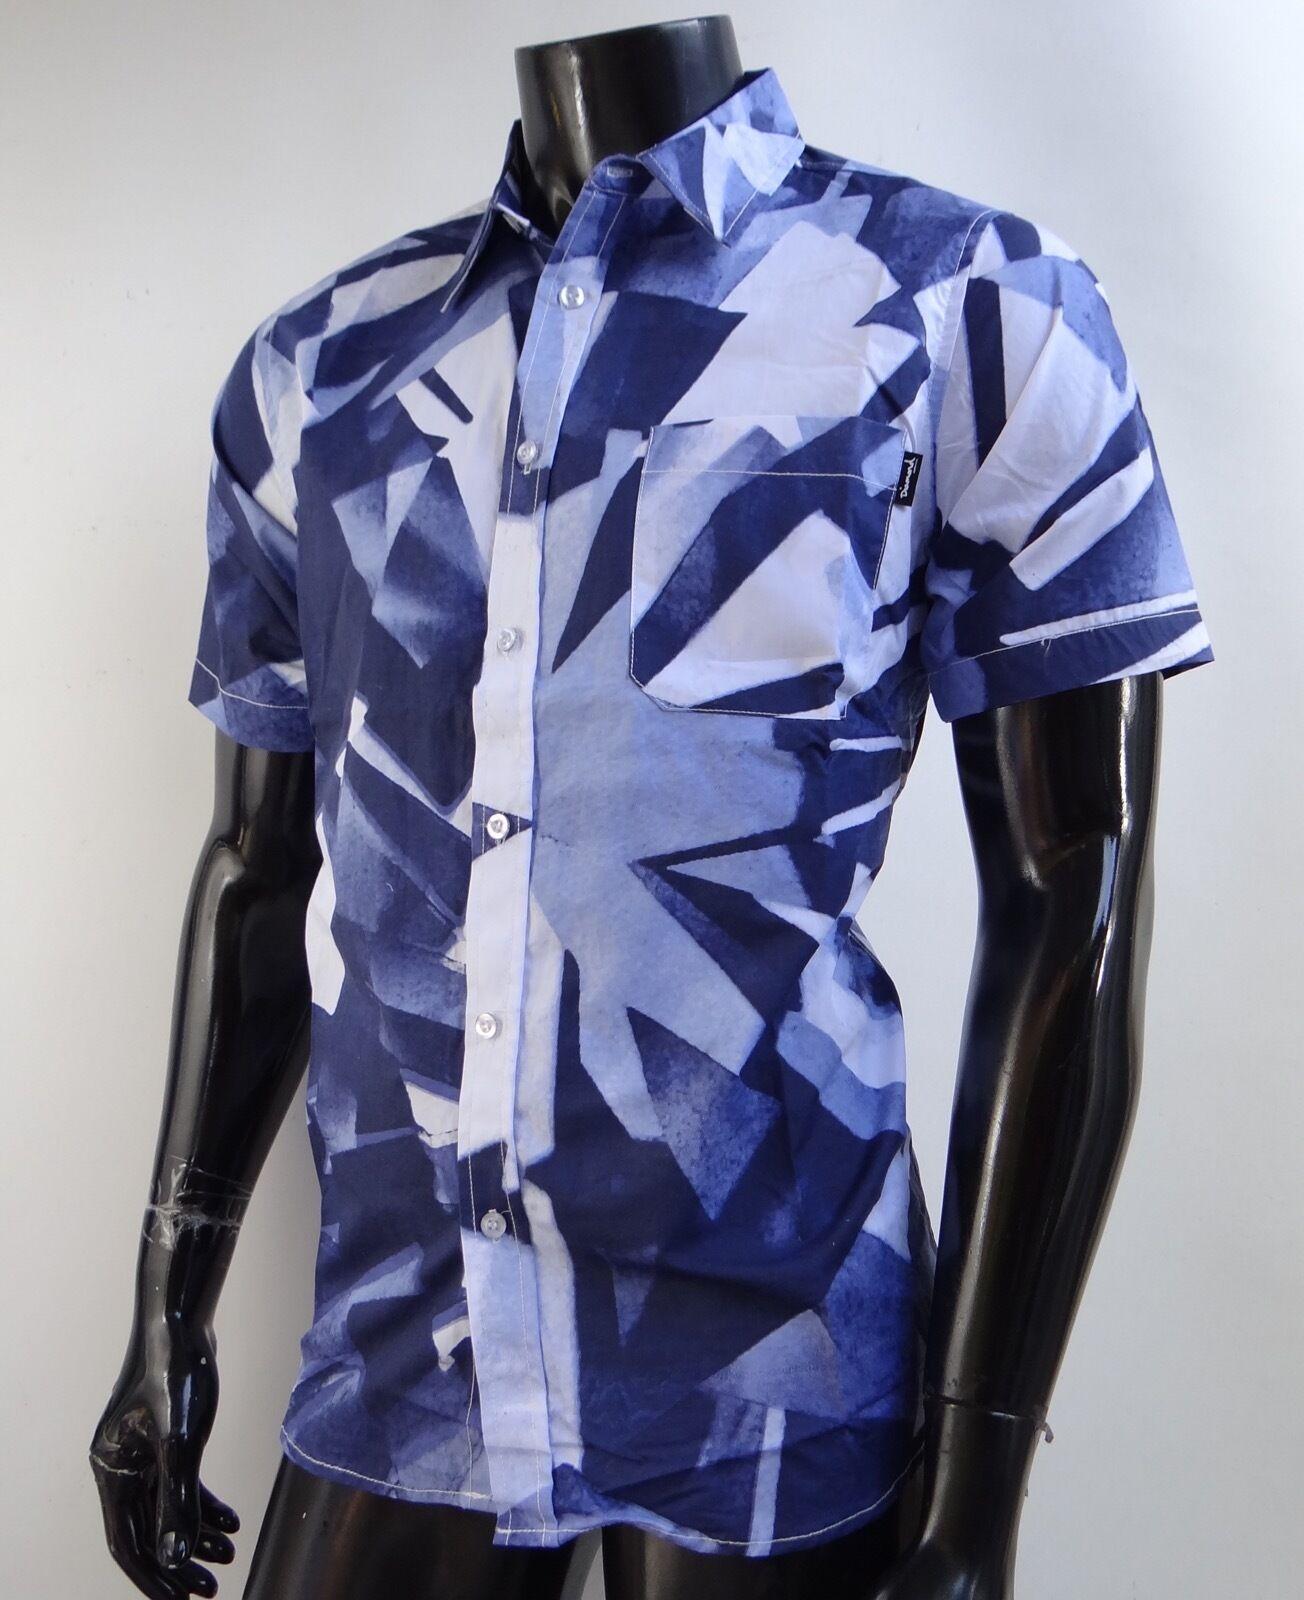 Diamons Supply co. Simplicity Woven Crew S S Shirt Mens Size Medium